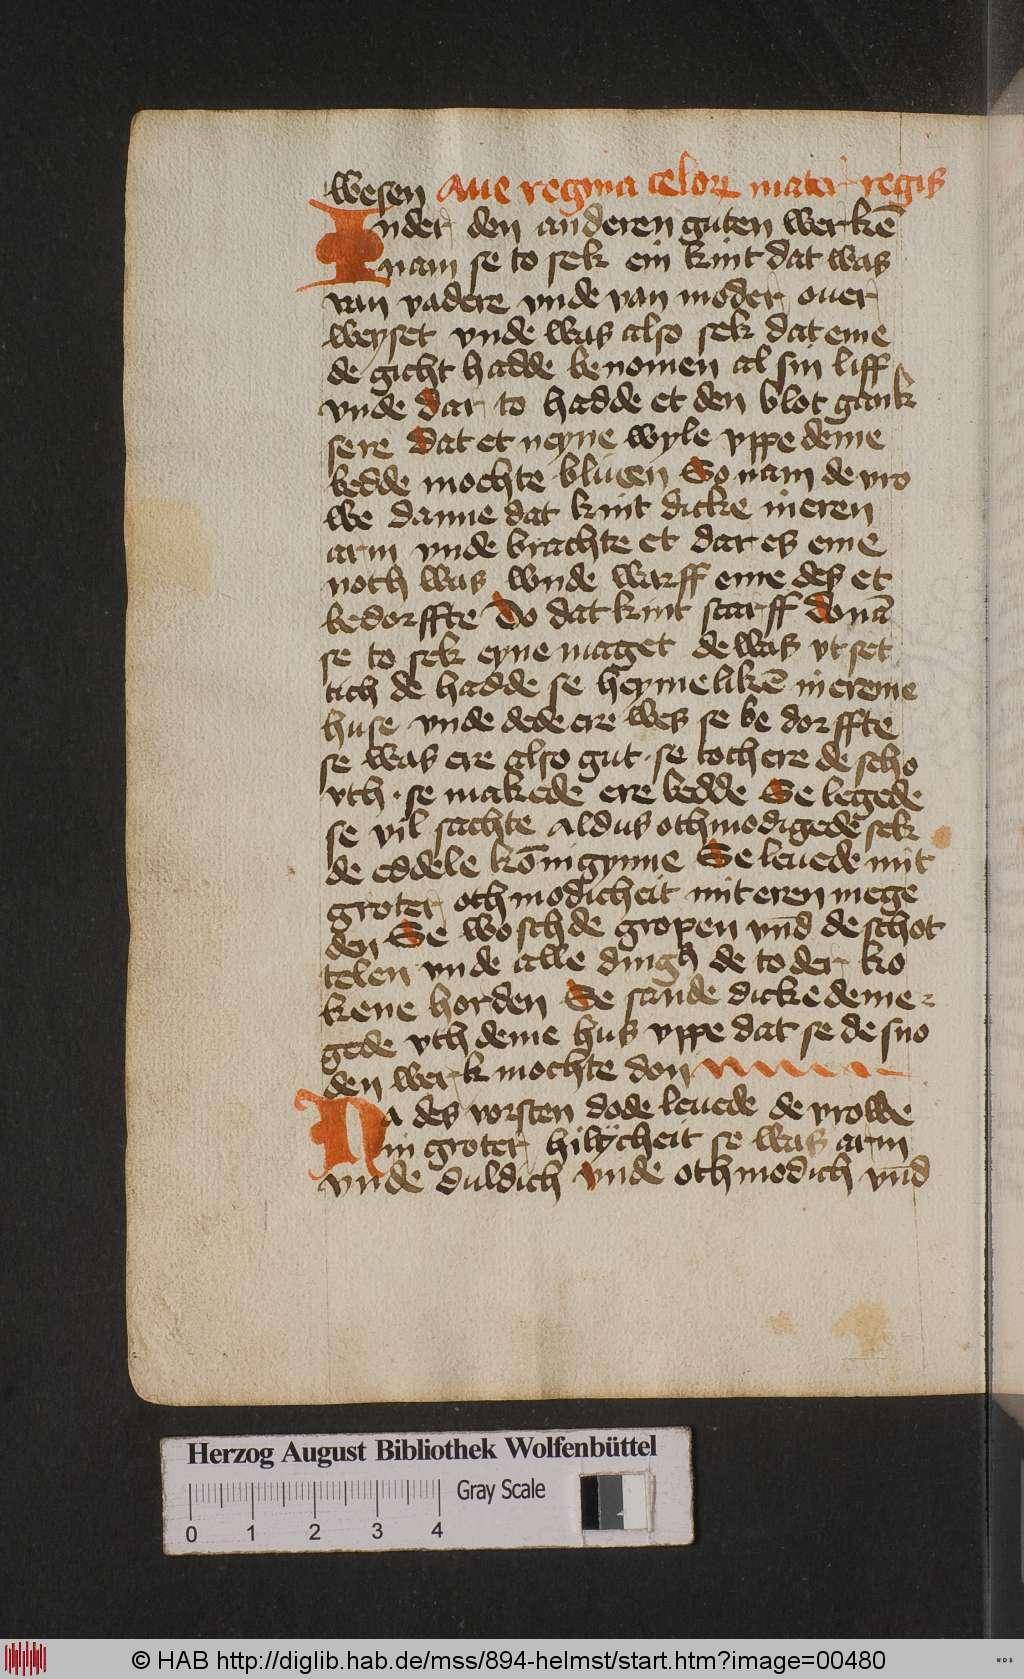 http://diglib.hab.de/mss/894-helmst/00480.jpg